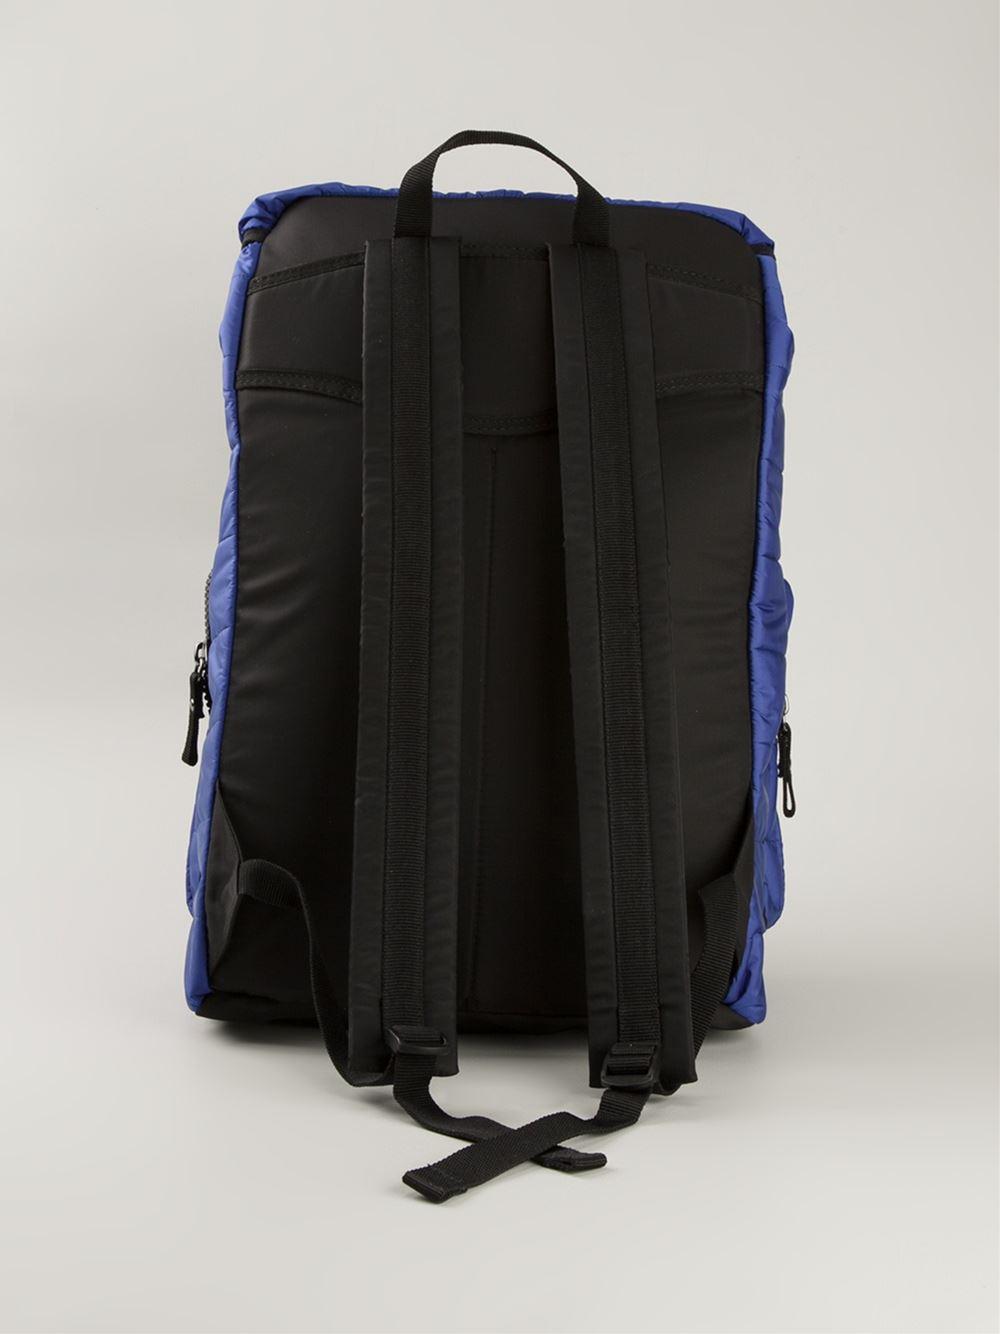 Moncler Quilted Backpack in Blue for Men